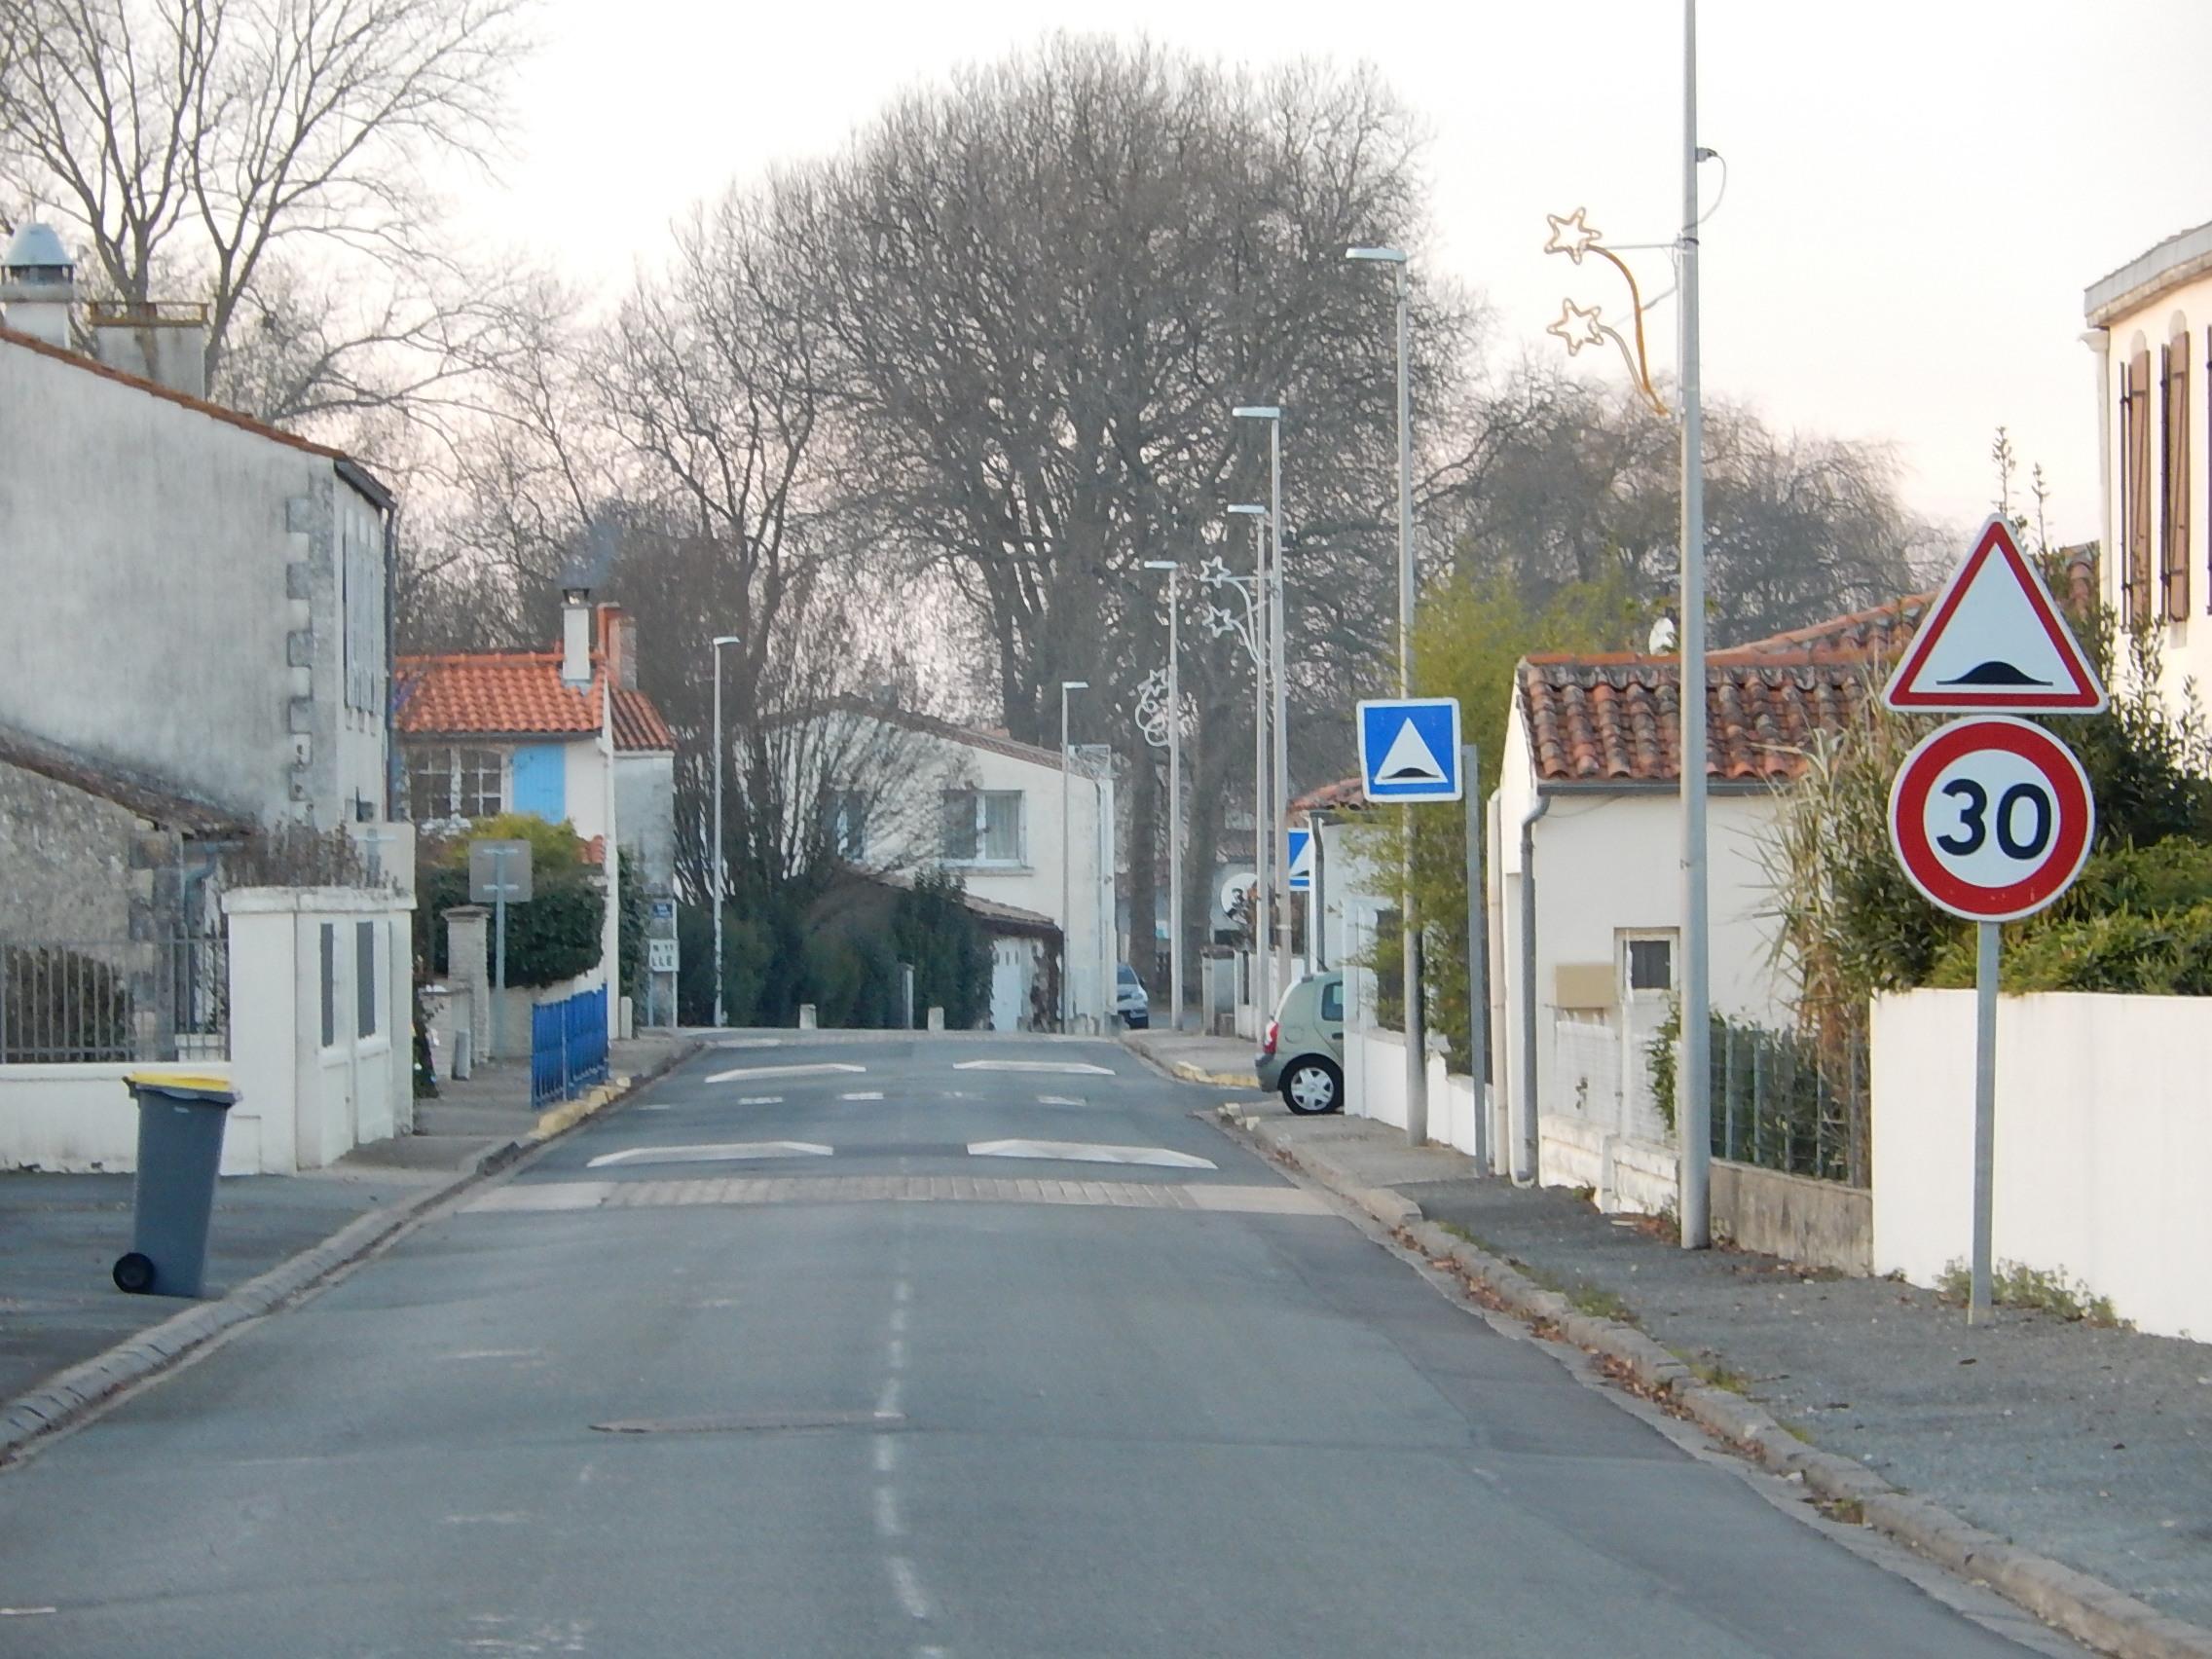 Longèves (Charente-Maritime)